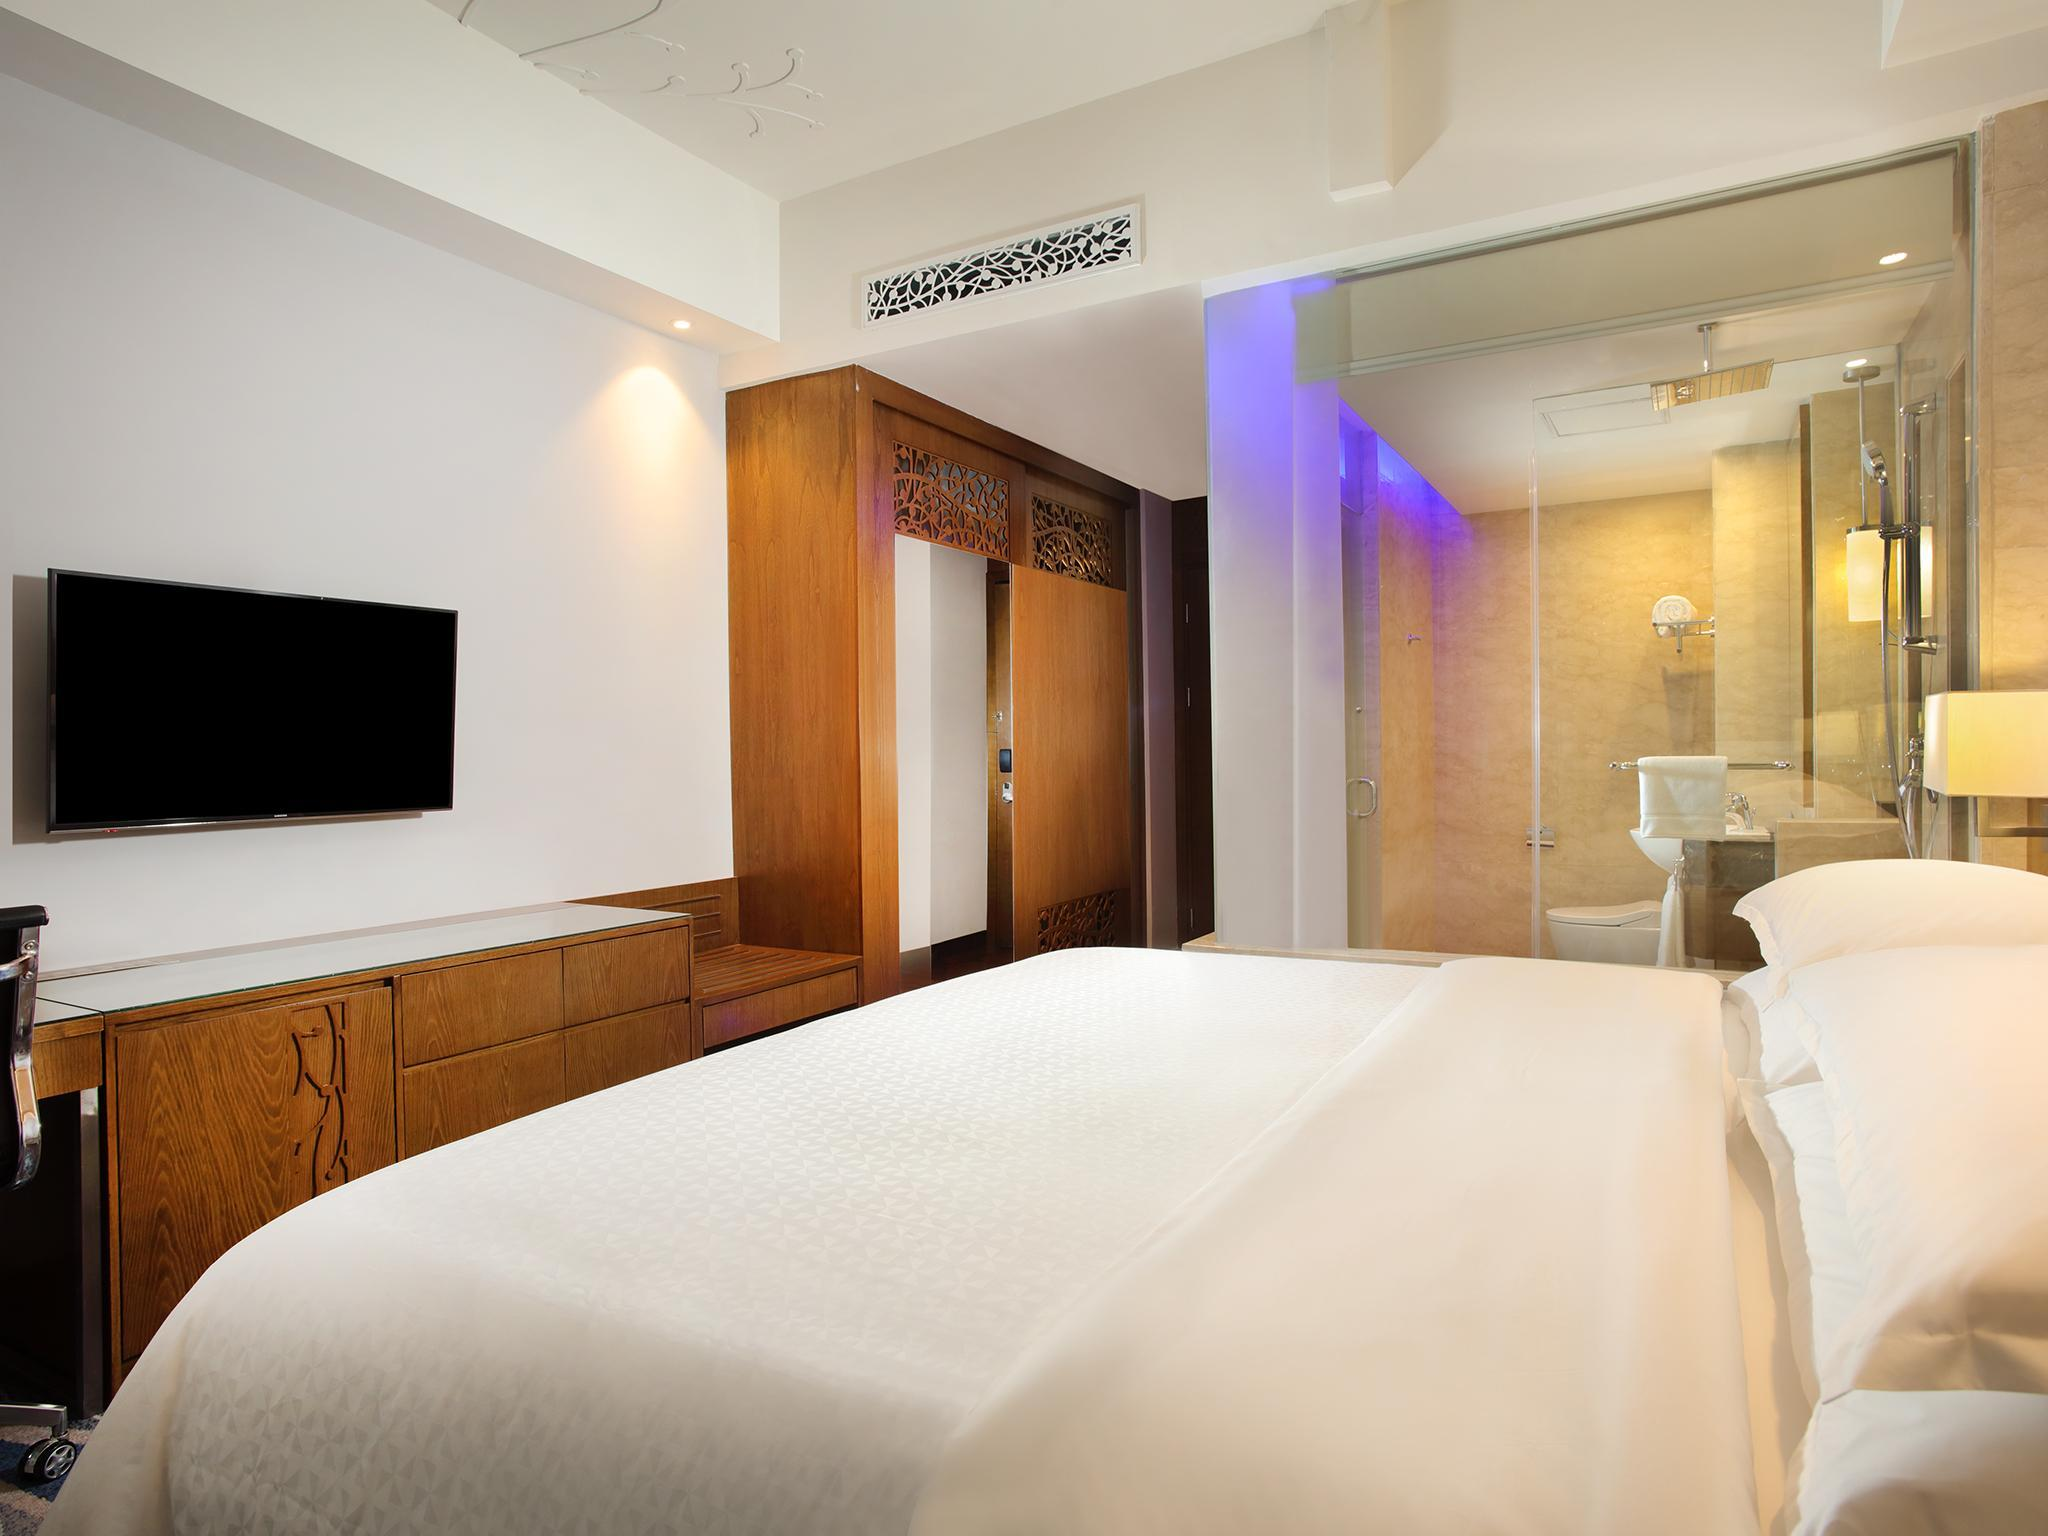 Hotel Four Points by Sheraton Manado - Jl. Piere Tendean Boulevard, Sario Manado - Manado